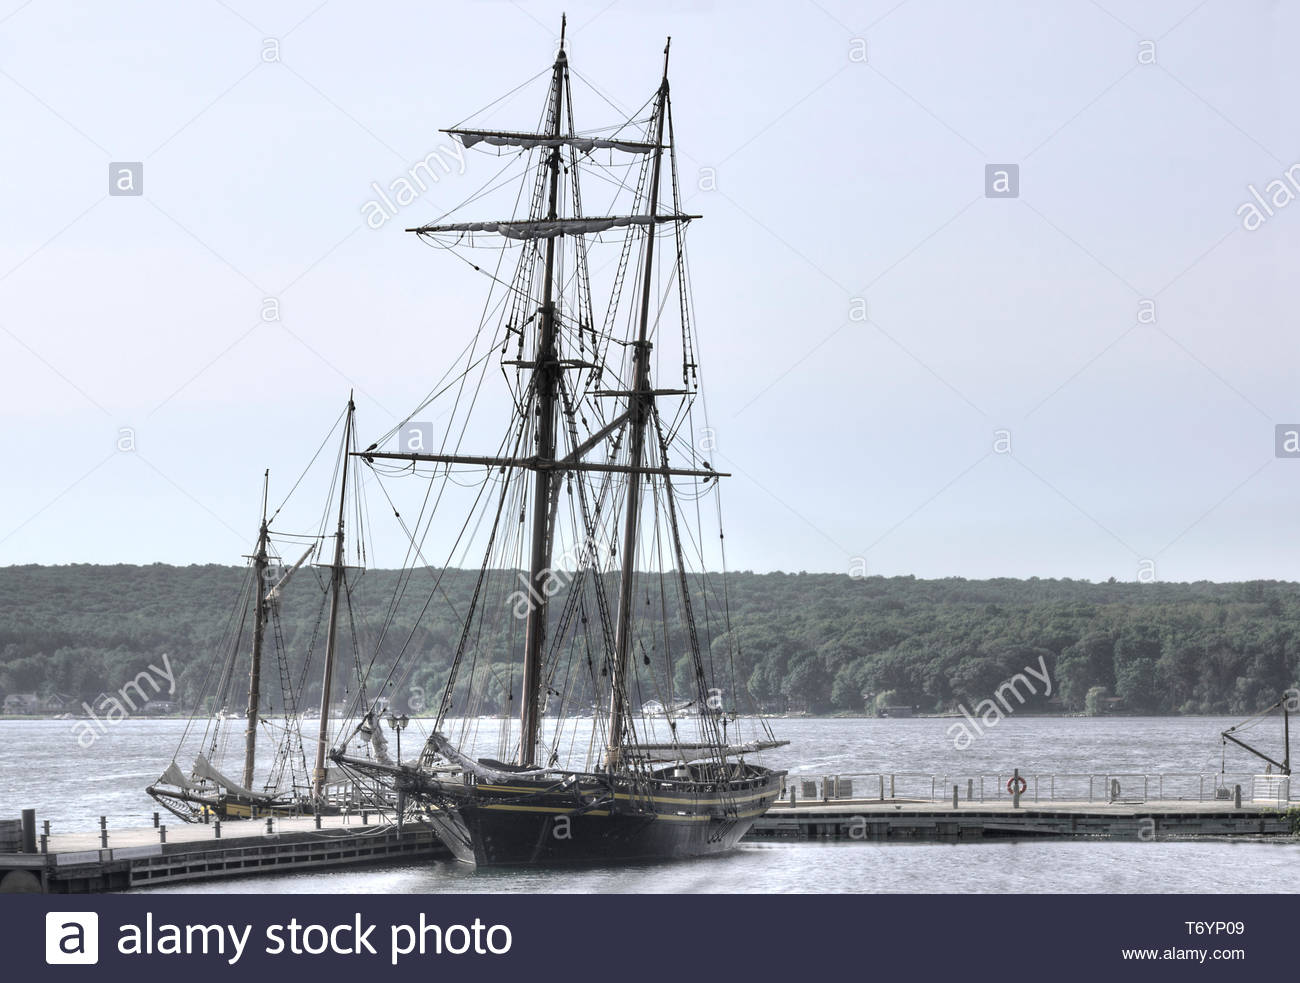 tall ship in harbour Discovery bay Penetanguishene Ontario Canada - Stock Image